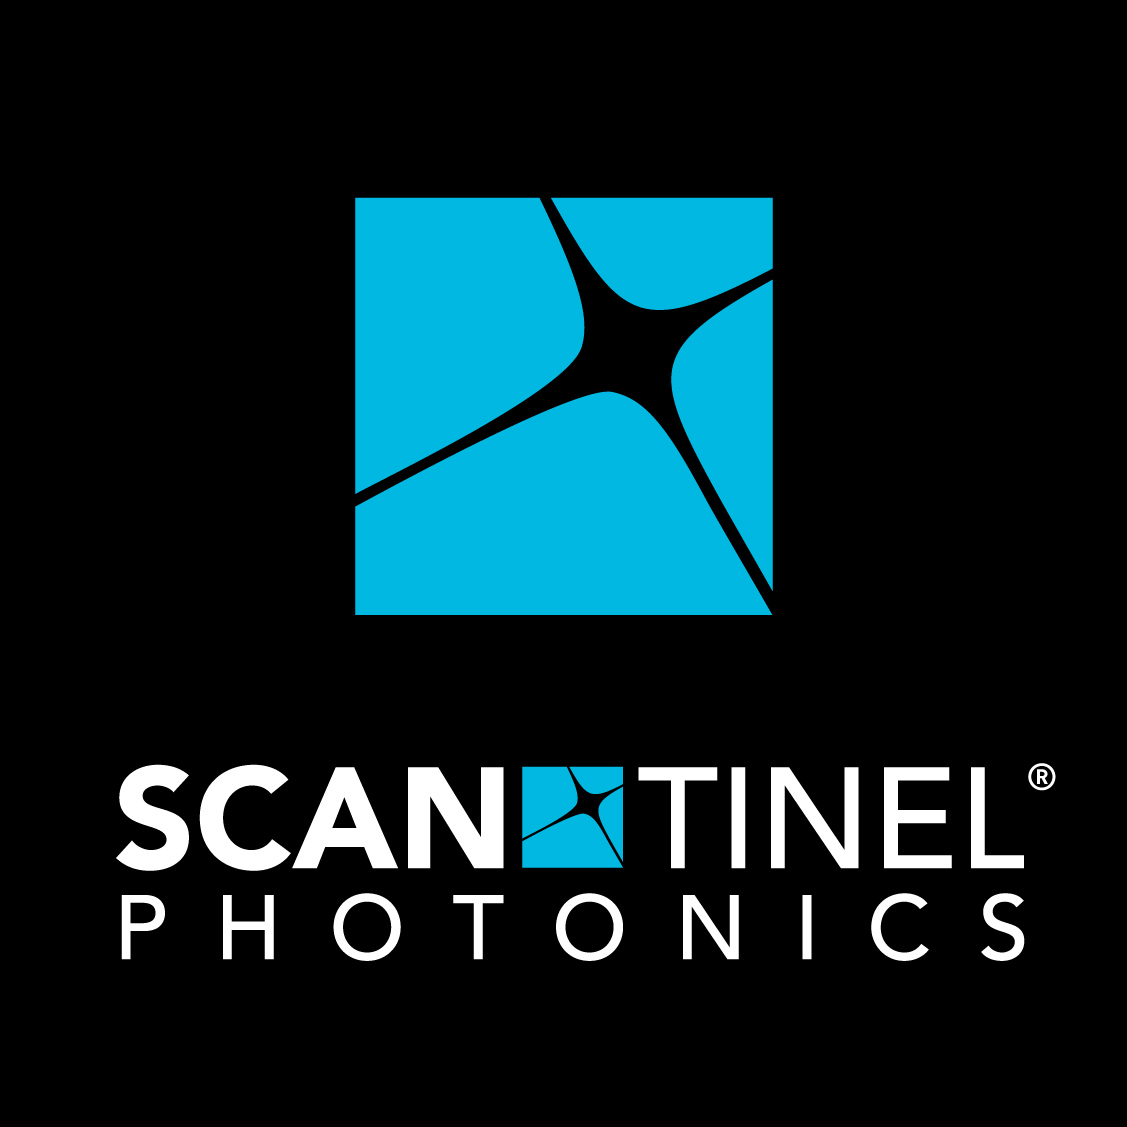 Scantinel Photonics GmbH